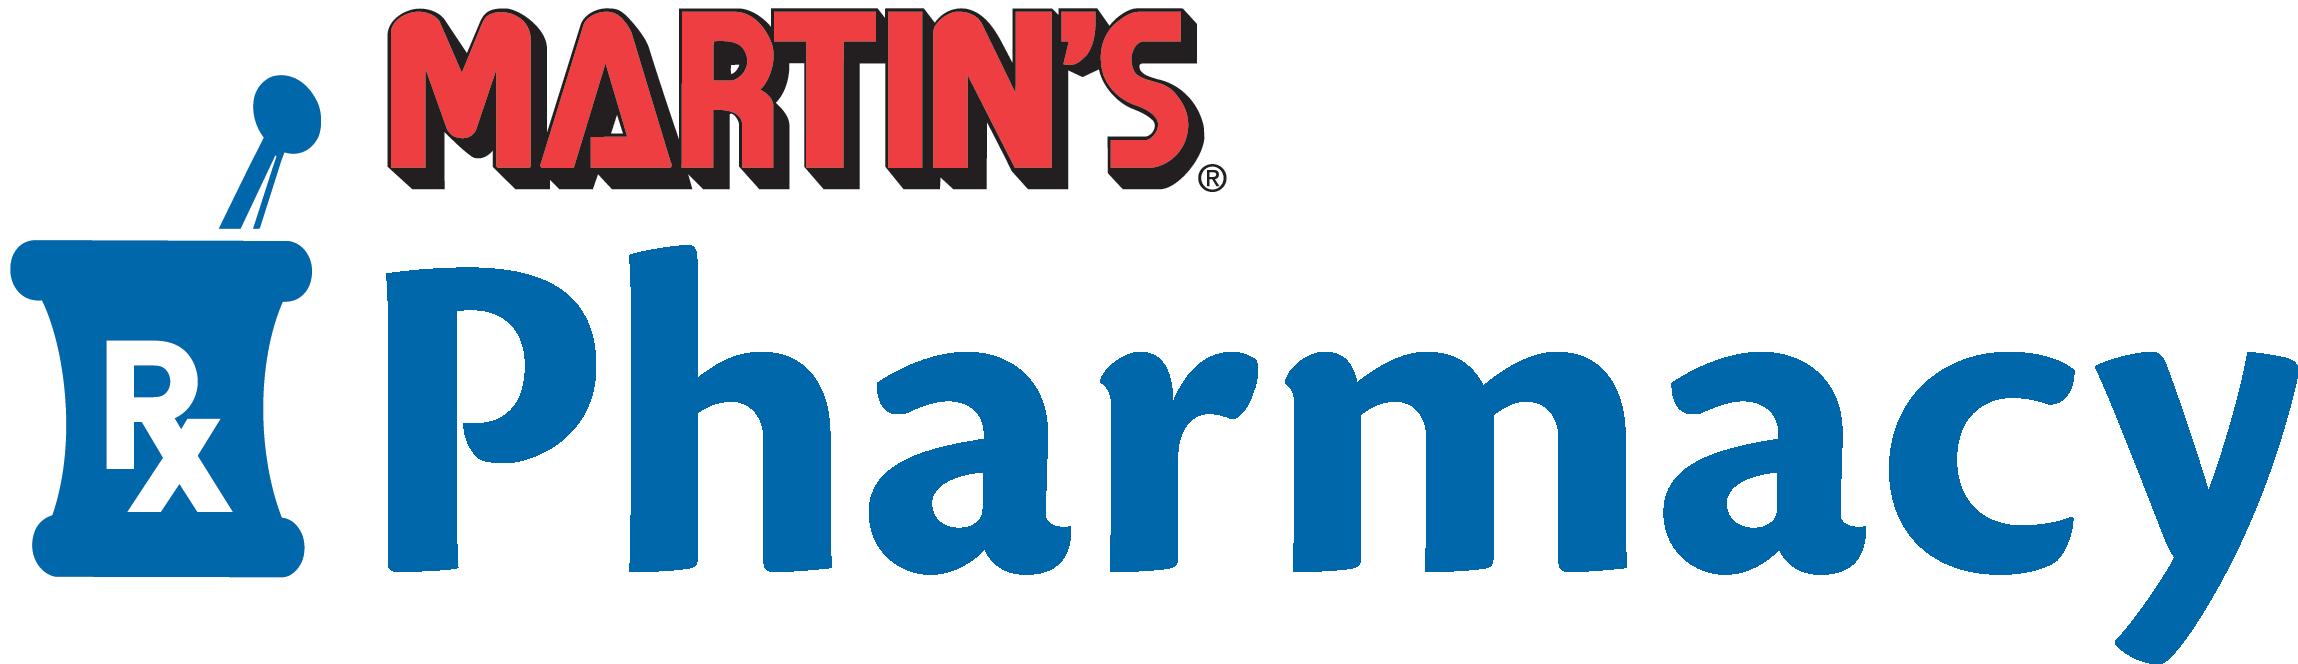 Martin's Pharmacy